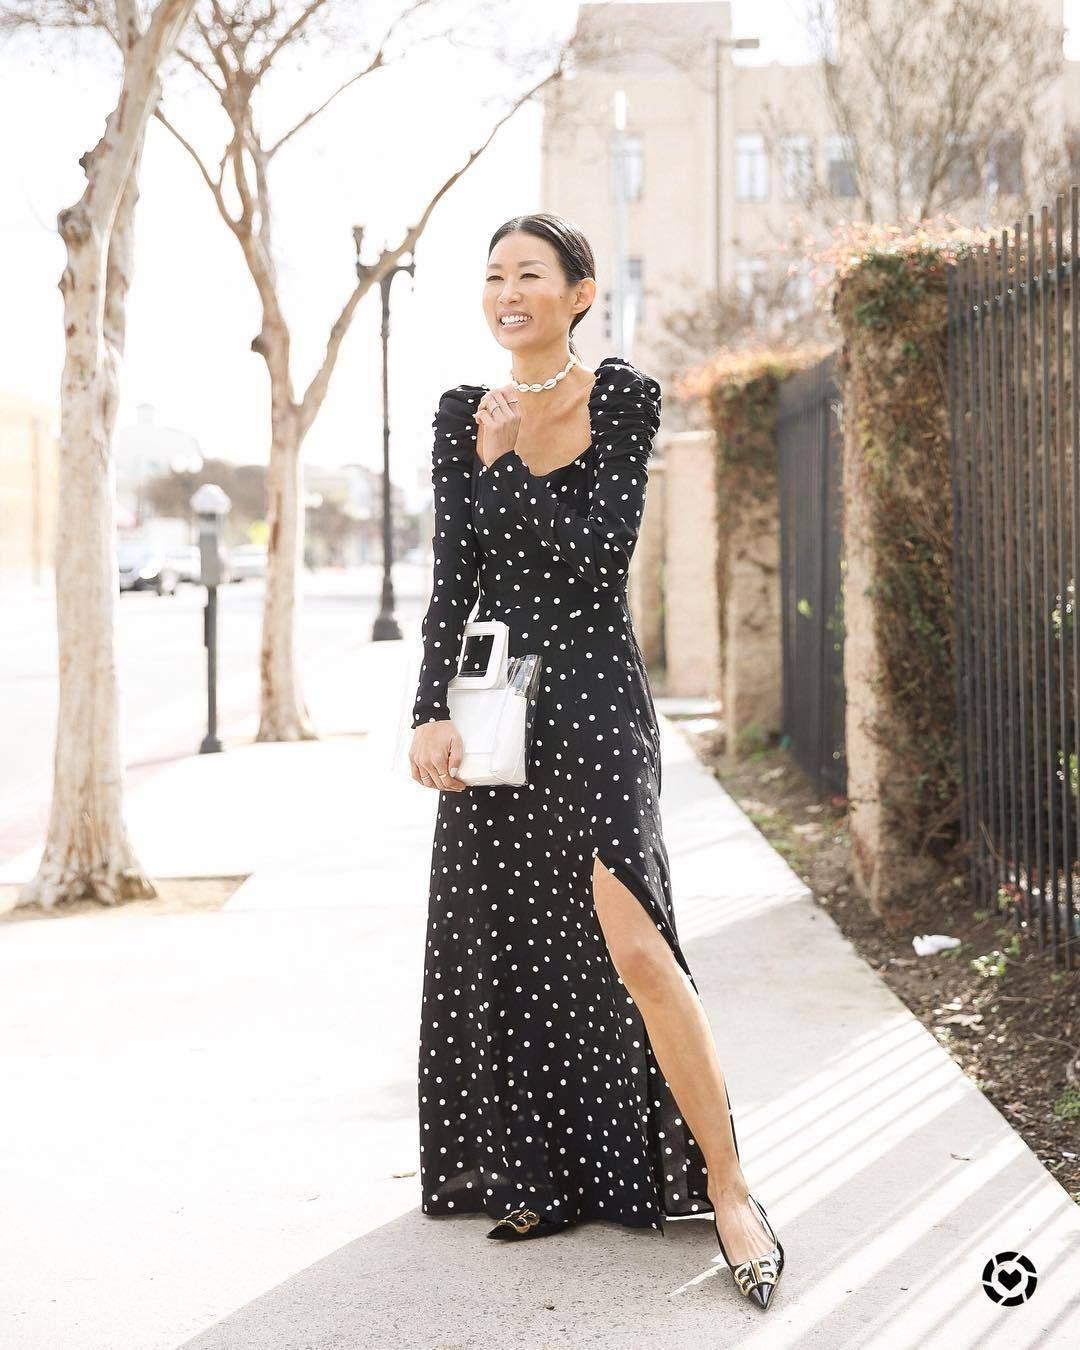 Get the dress for 79£ at stories.com – Wheretoget